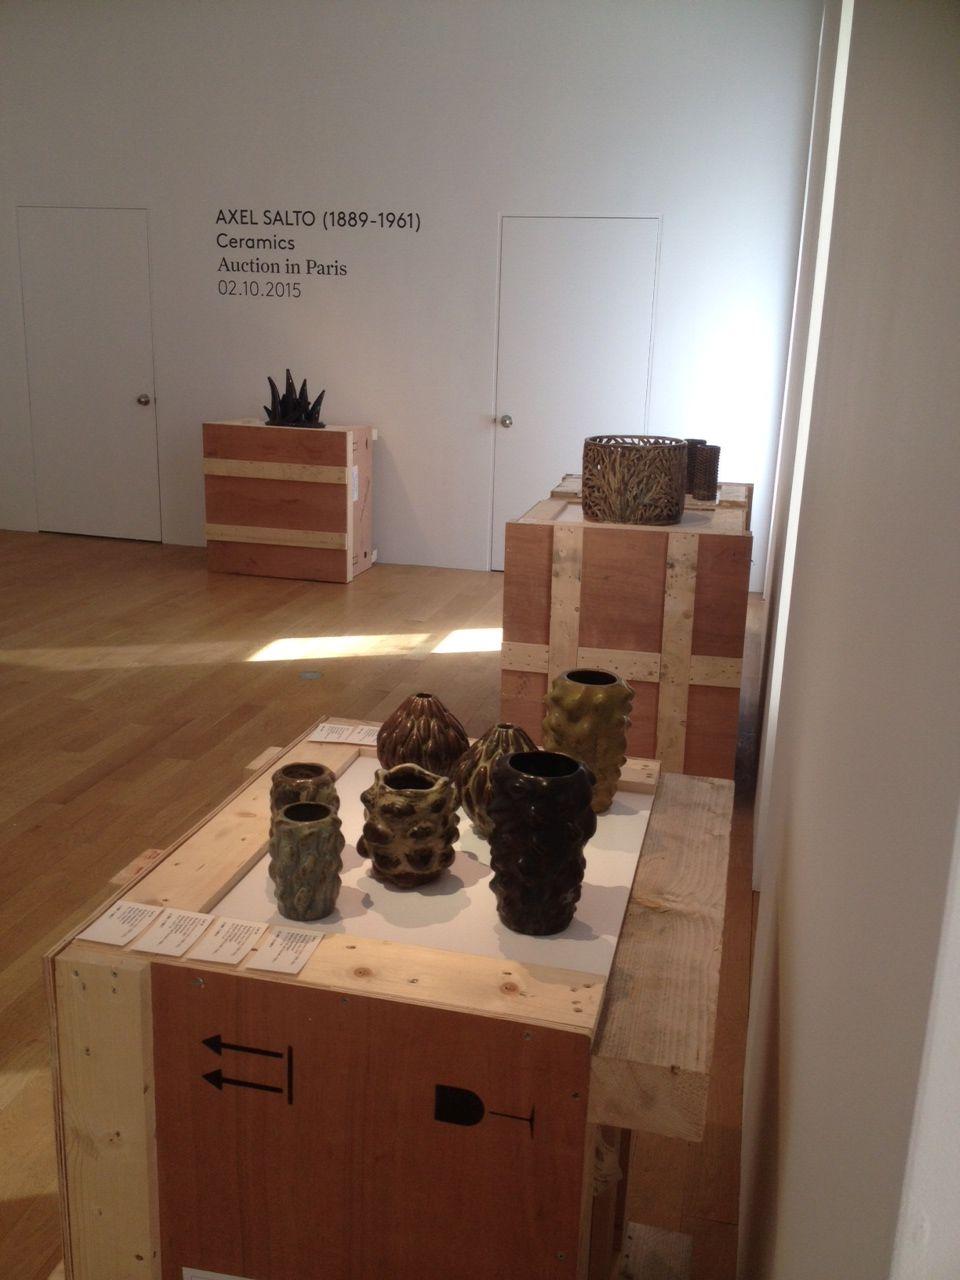 Exposition preview Axel Salto, ceramics New-York @friedman&vallois 27E67th St #AxelSalto #Friedmanvallois #ceramics